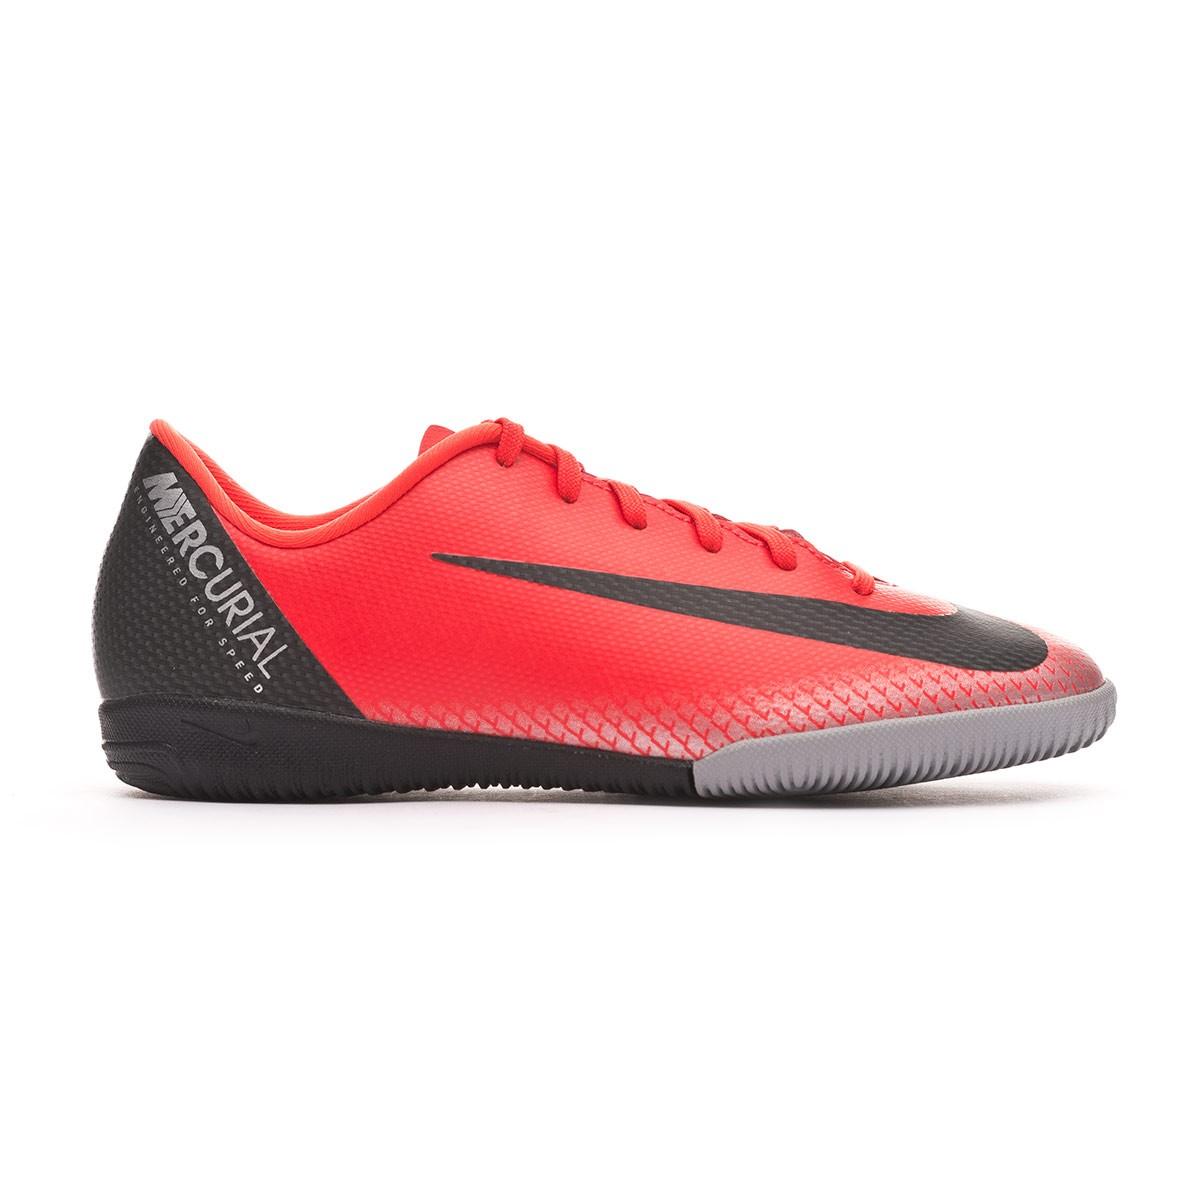 Vaporx Xii Bright Academy Junior Ic Nike Mercurial Cr7 Scarpe xwqCf46W